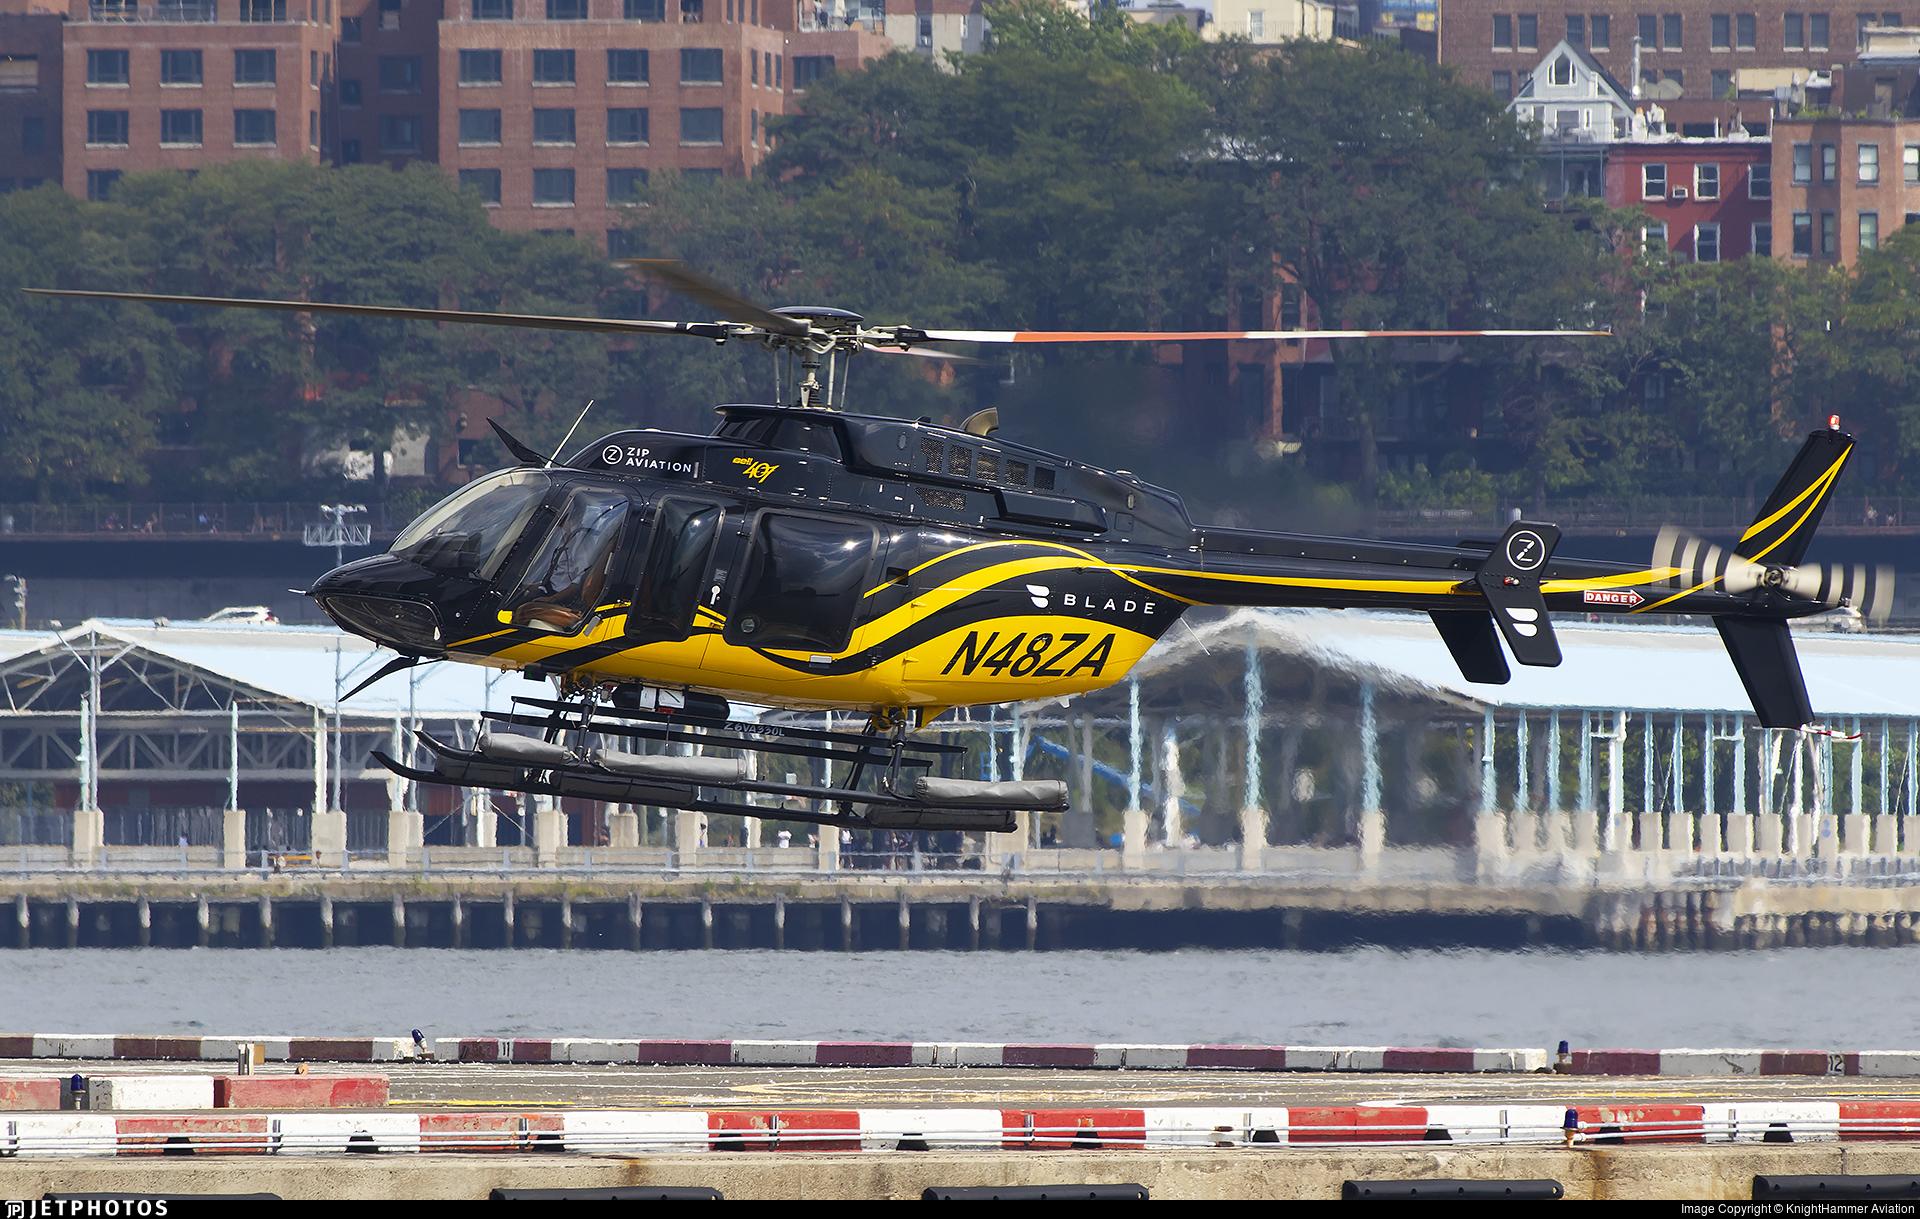 N48ZA - Bell 407 - Zip